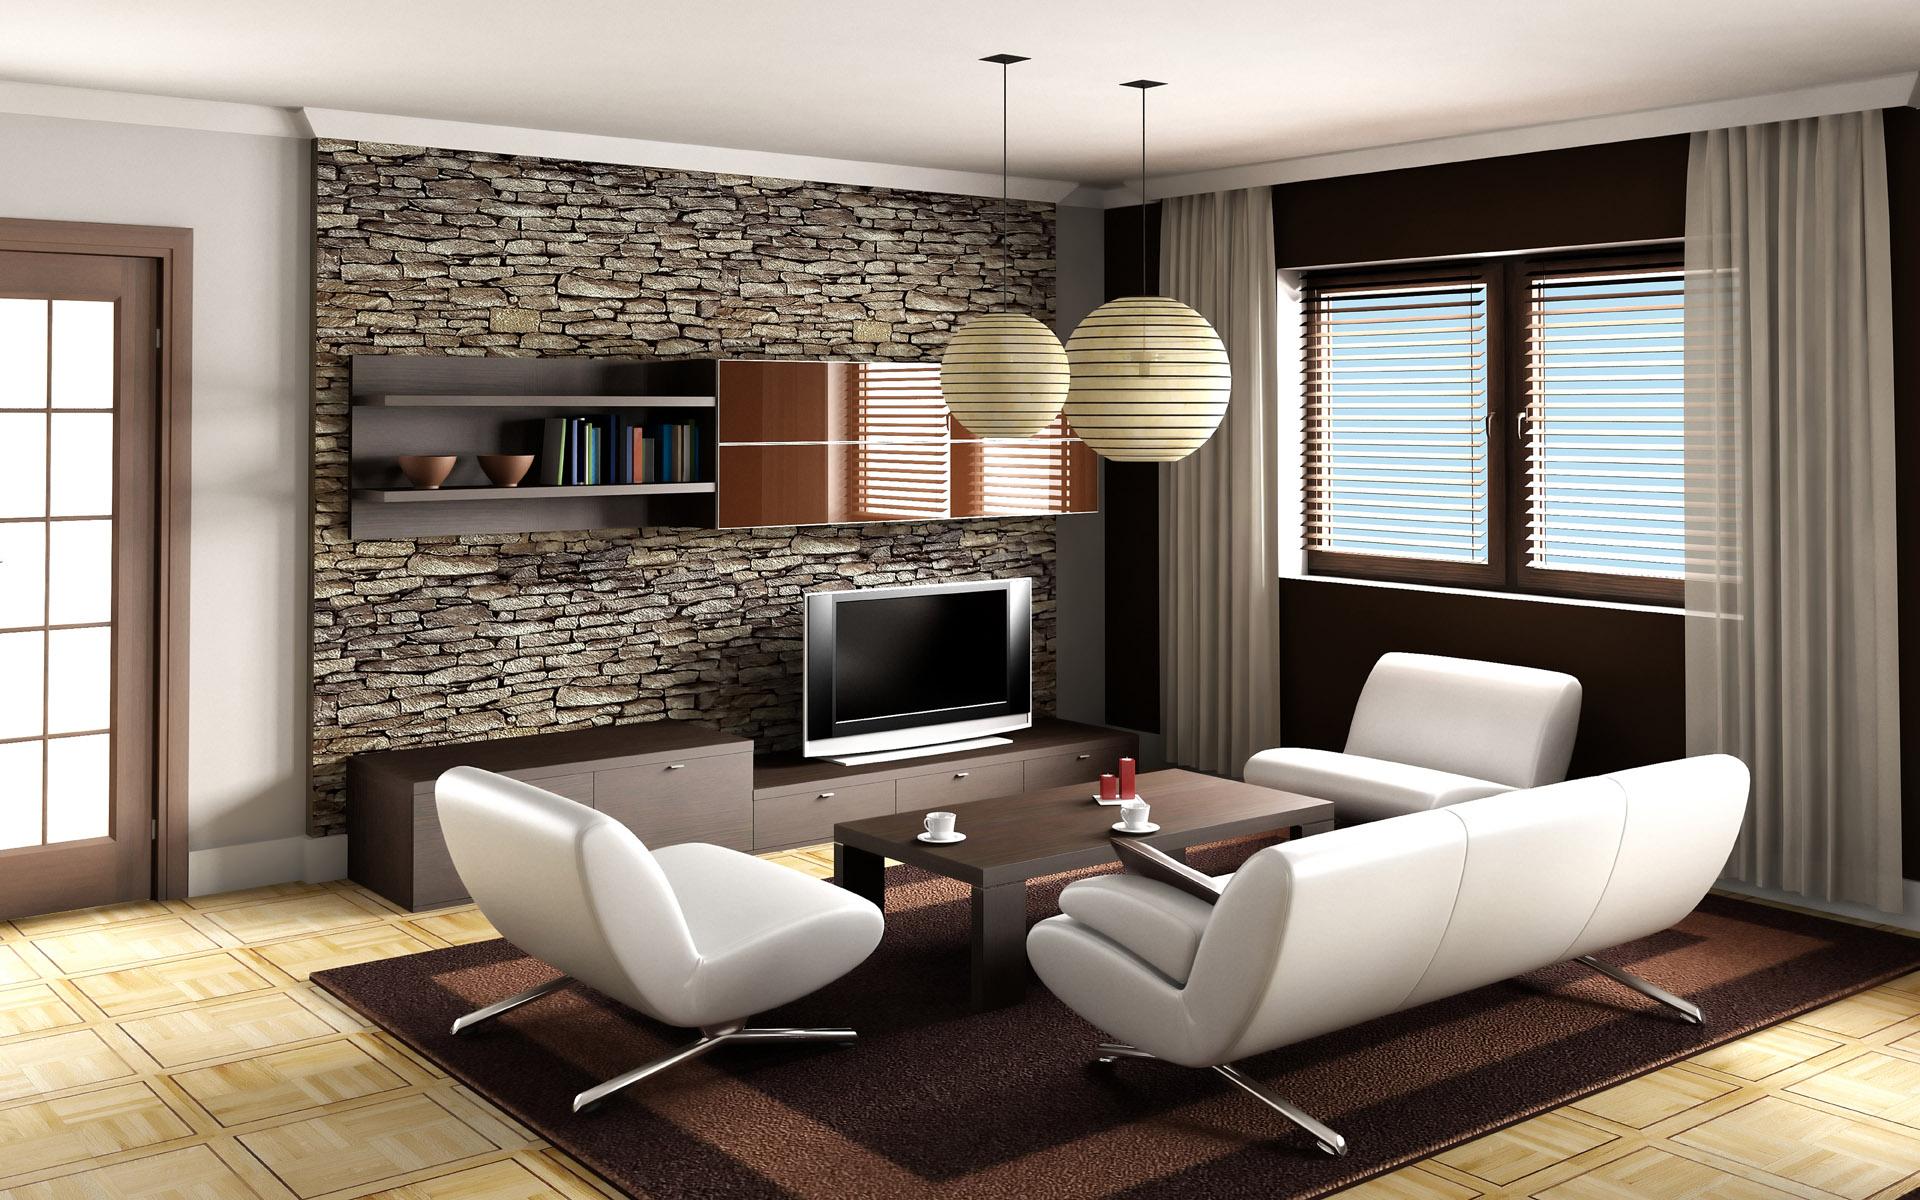 House Rooms Designs - Home Design Ideas